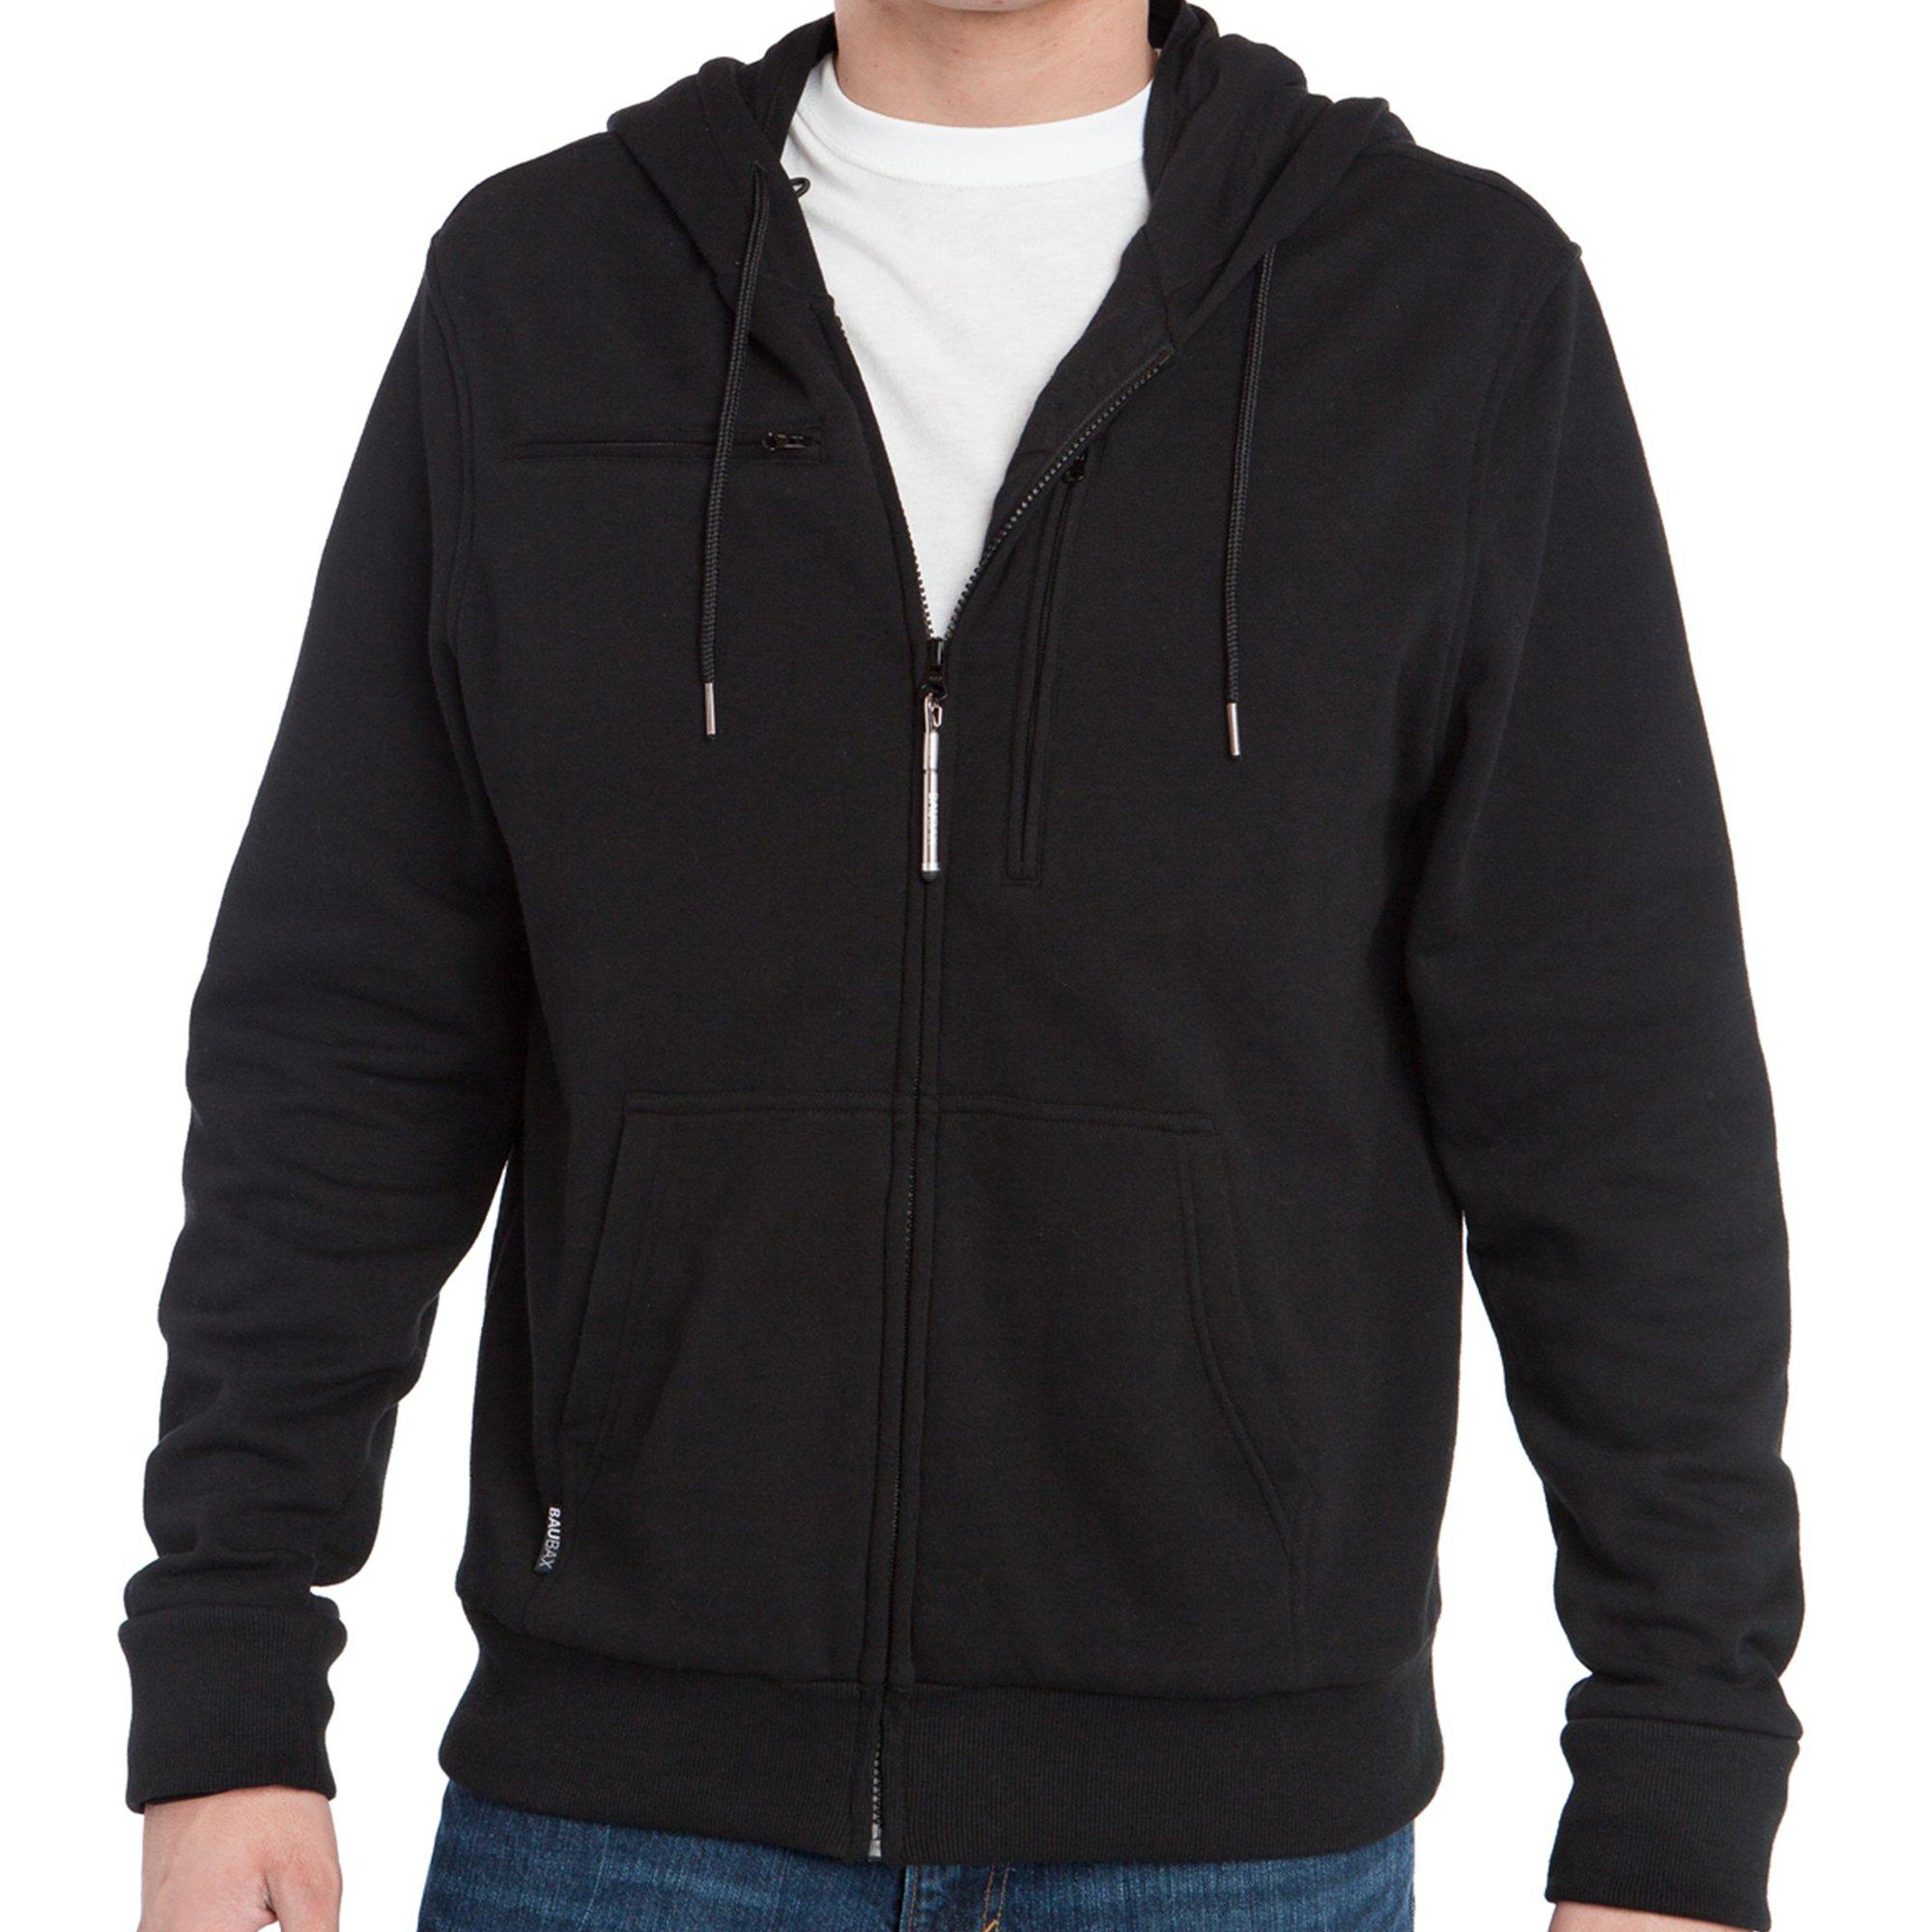 Baubax Travel Jacket - Sweatshirt - Male - Black - Large